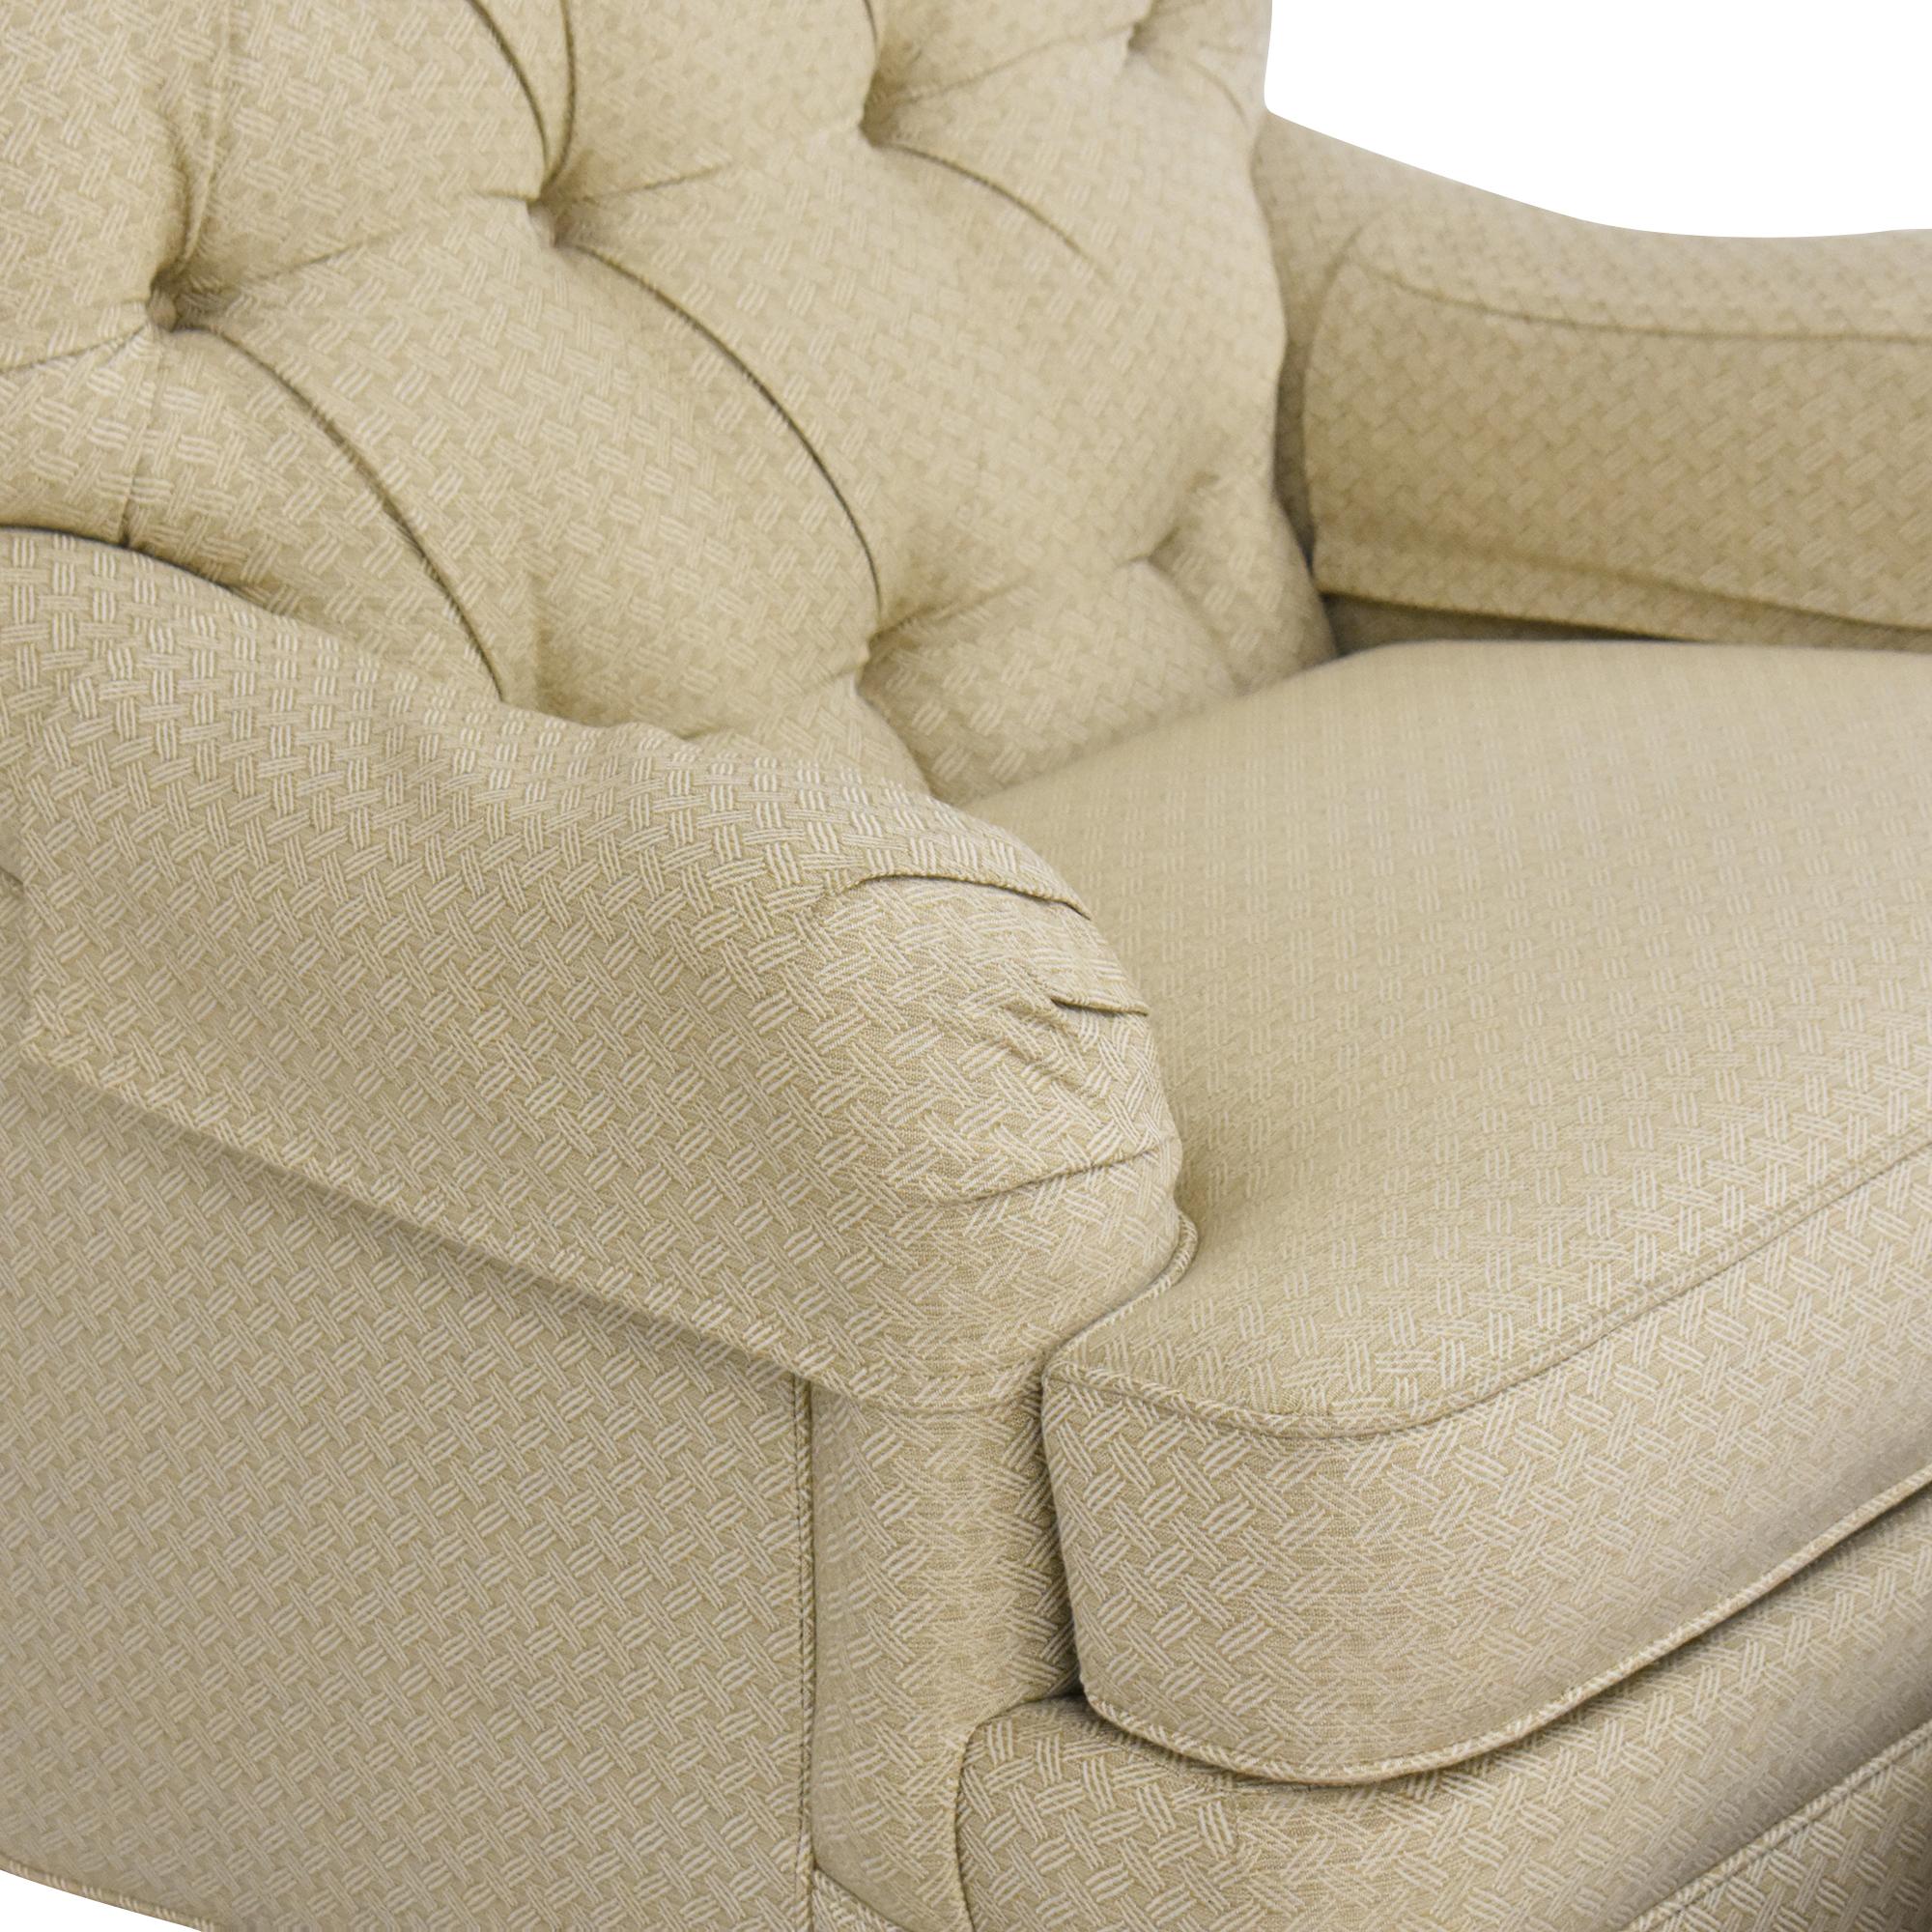 buy Ethan Allen Ethan Allen Mercer Tufted Chair with Ottoman online